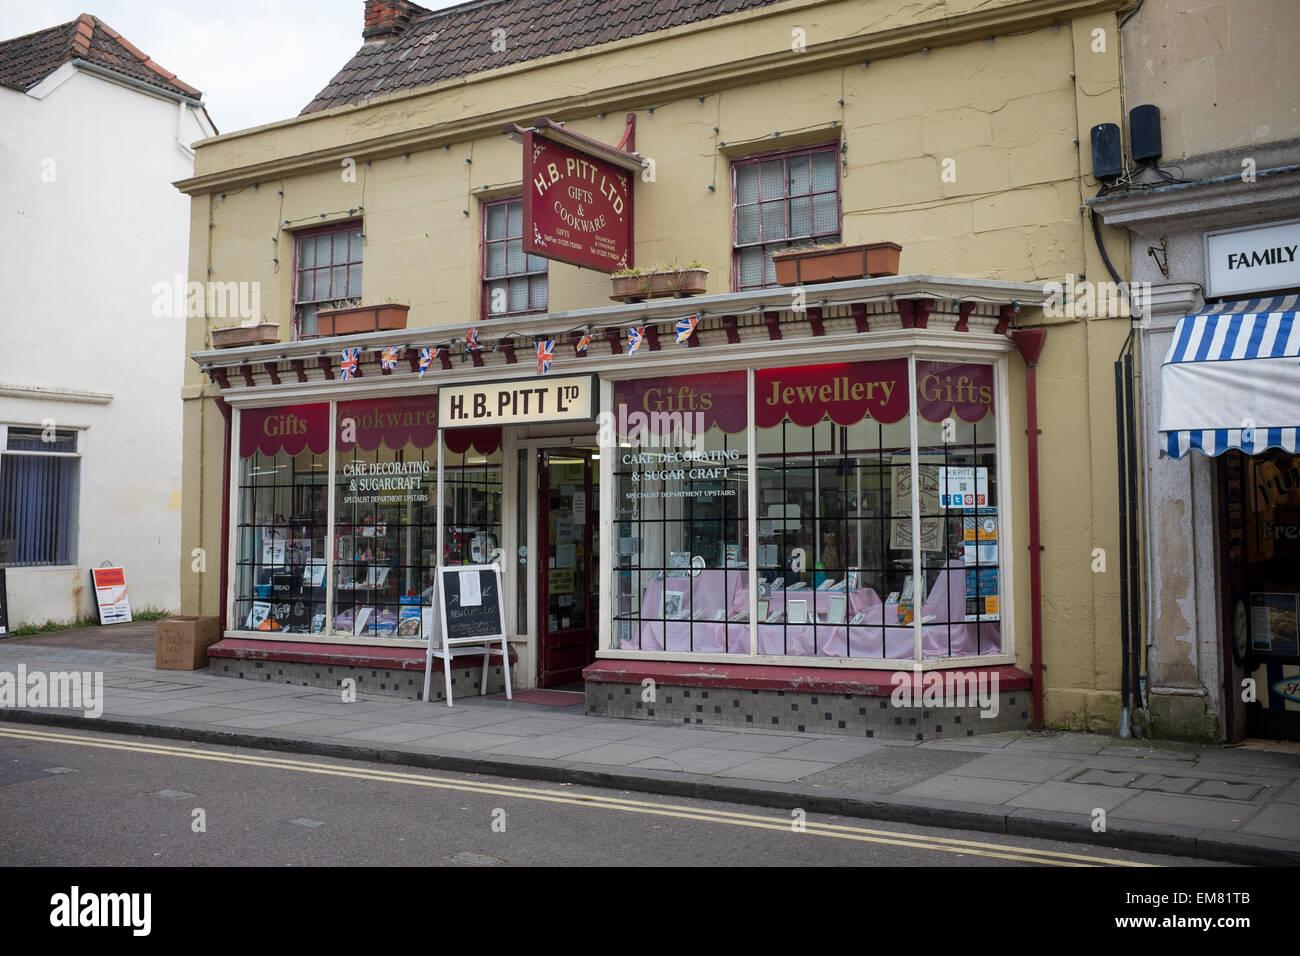 H B Pitt Ltd Gift and Cookware Shop Trowbridge Stock Photo ...